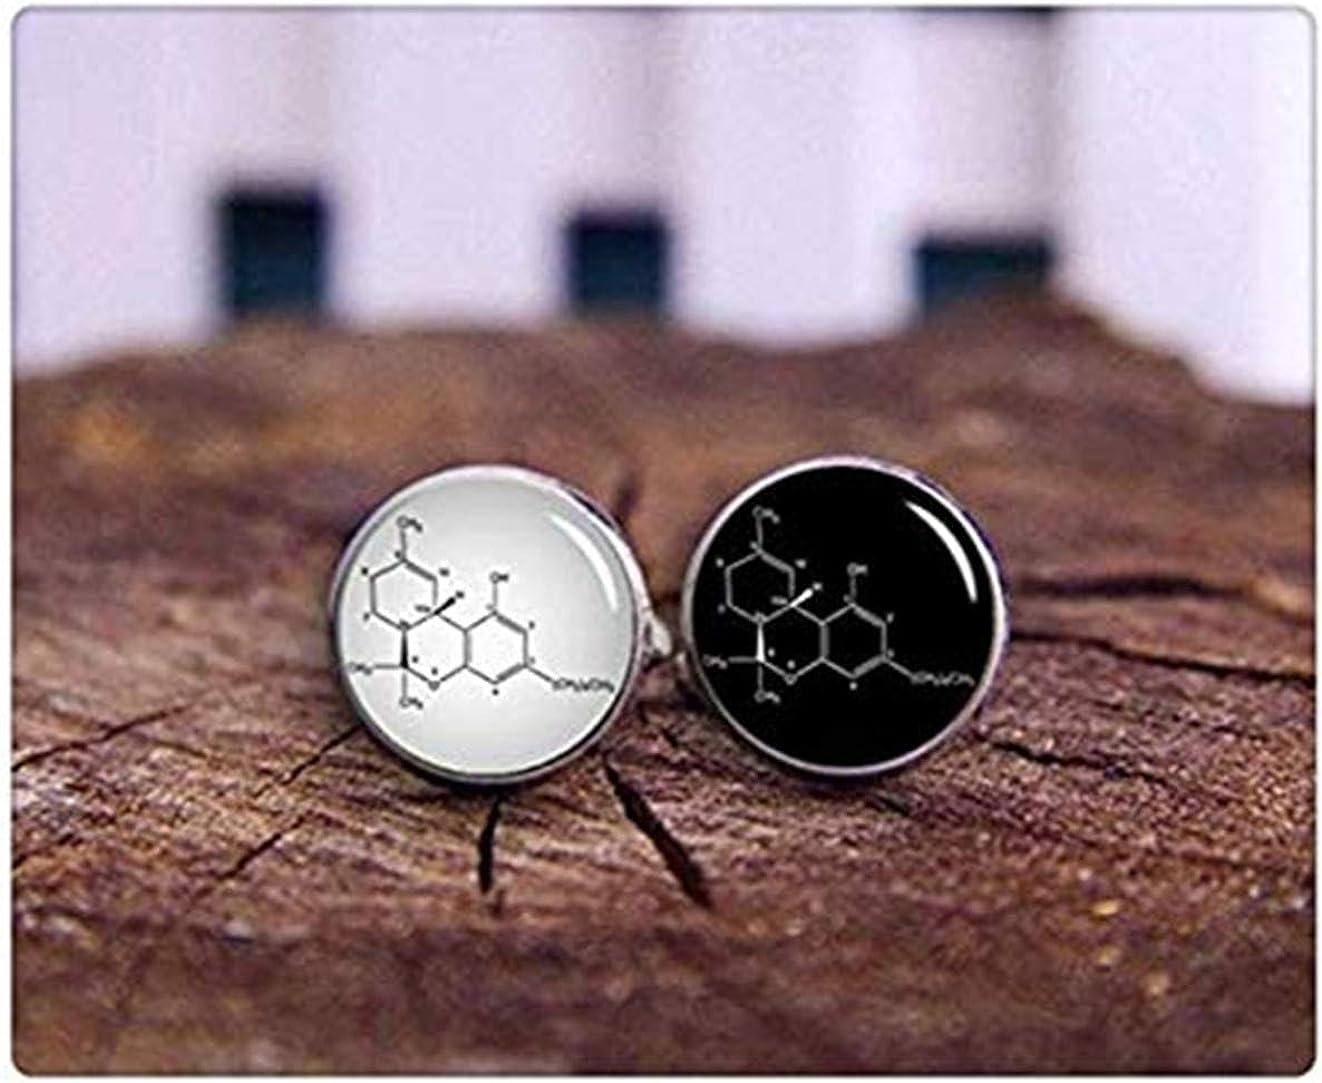 Tetrahydrocannabinol Molecular Formula Marijuana Cufflinks Death Devil Art Picture Cuff Links,Custom Chemical Formula Cufflinks Custom Personalized Cufflinks,Gift of Love THC Cufflinks